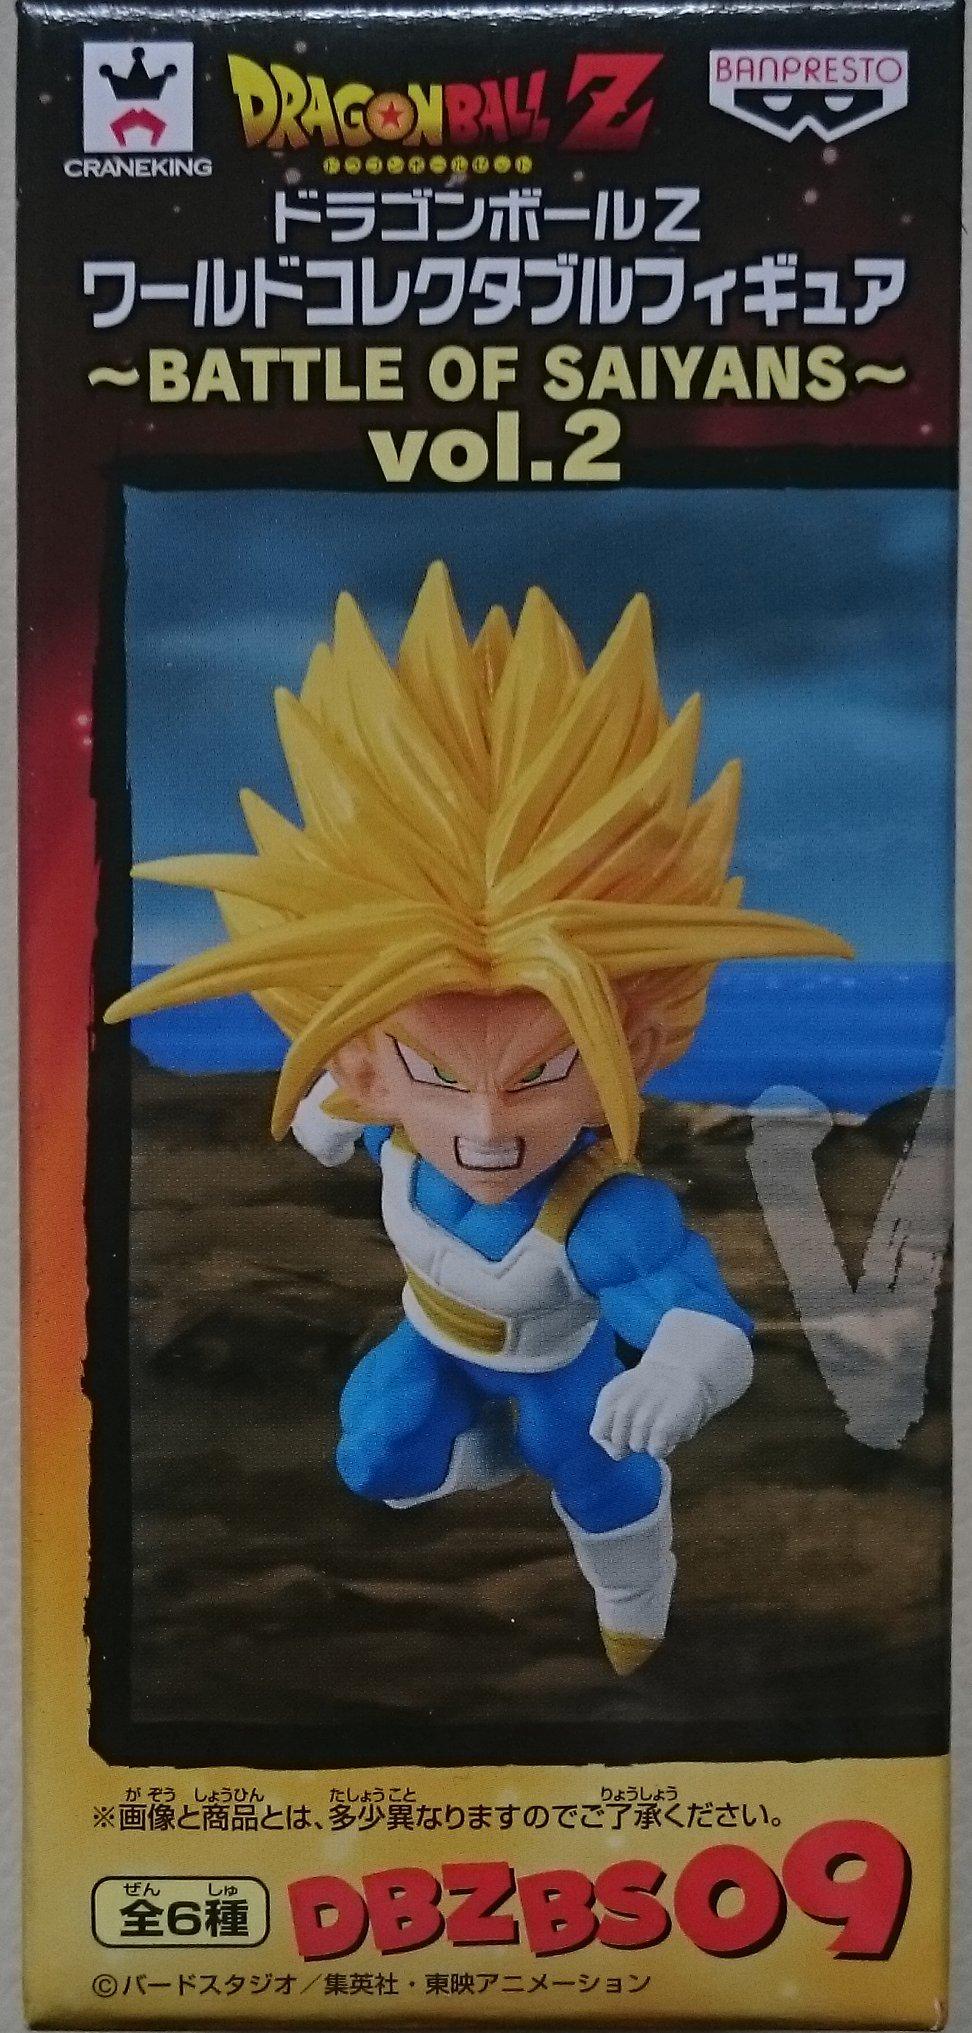 Dragon Ball Z world collectable figure - BATTLE OF SAIYANS-vol.2 Super Saiyan trunks by World collectable figure